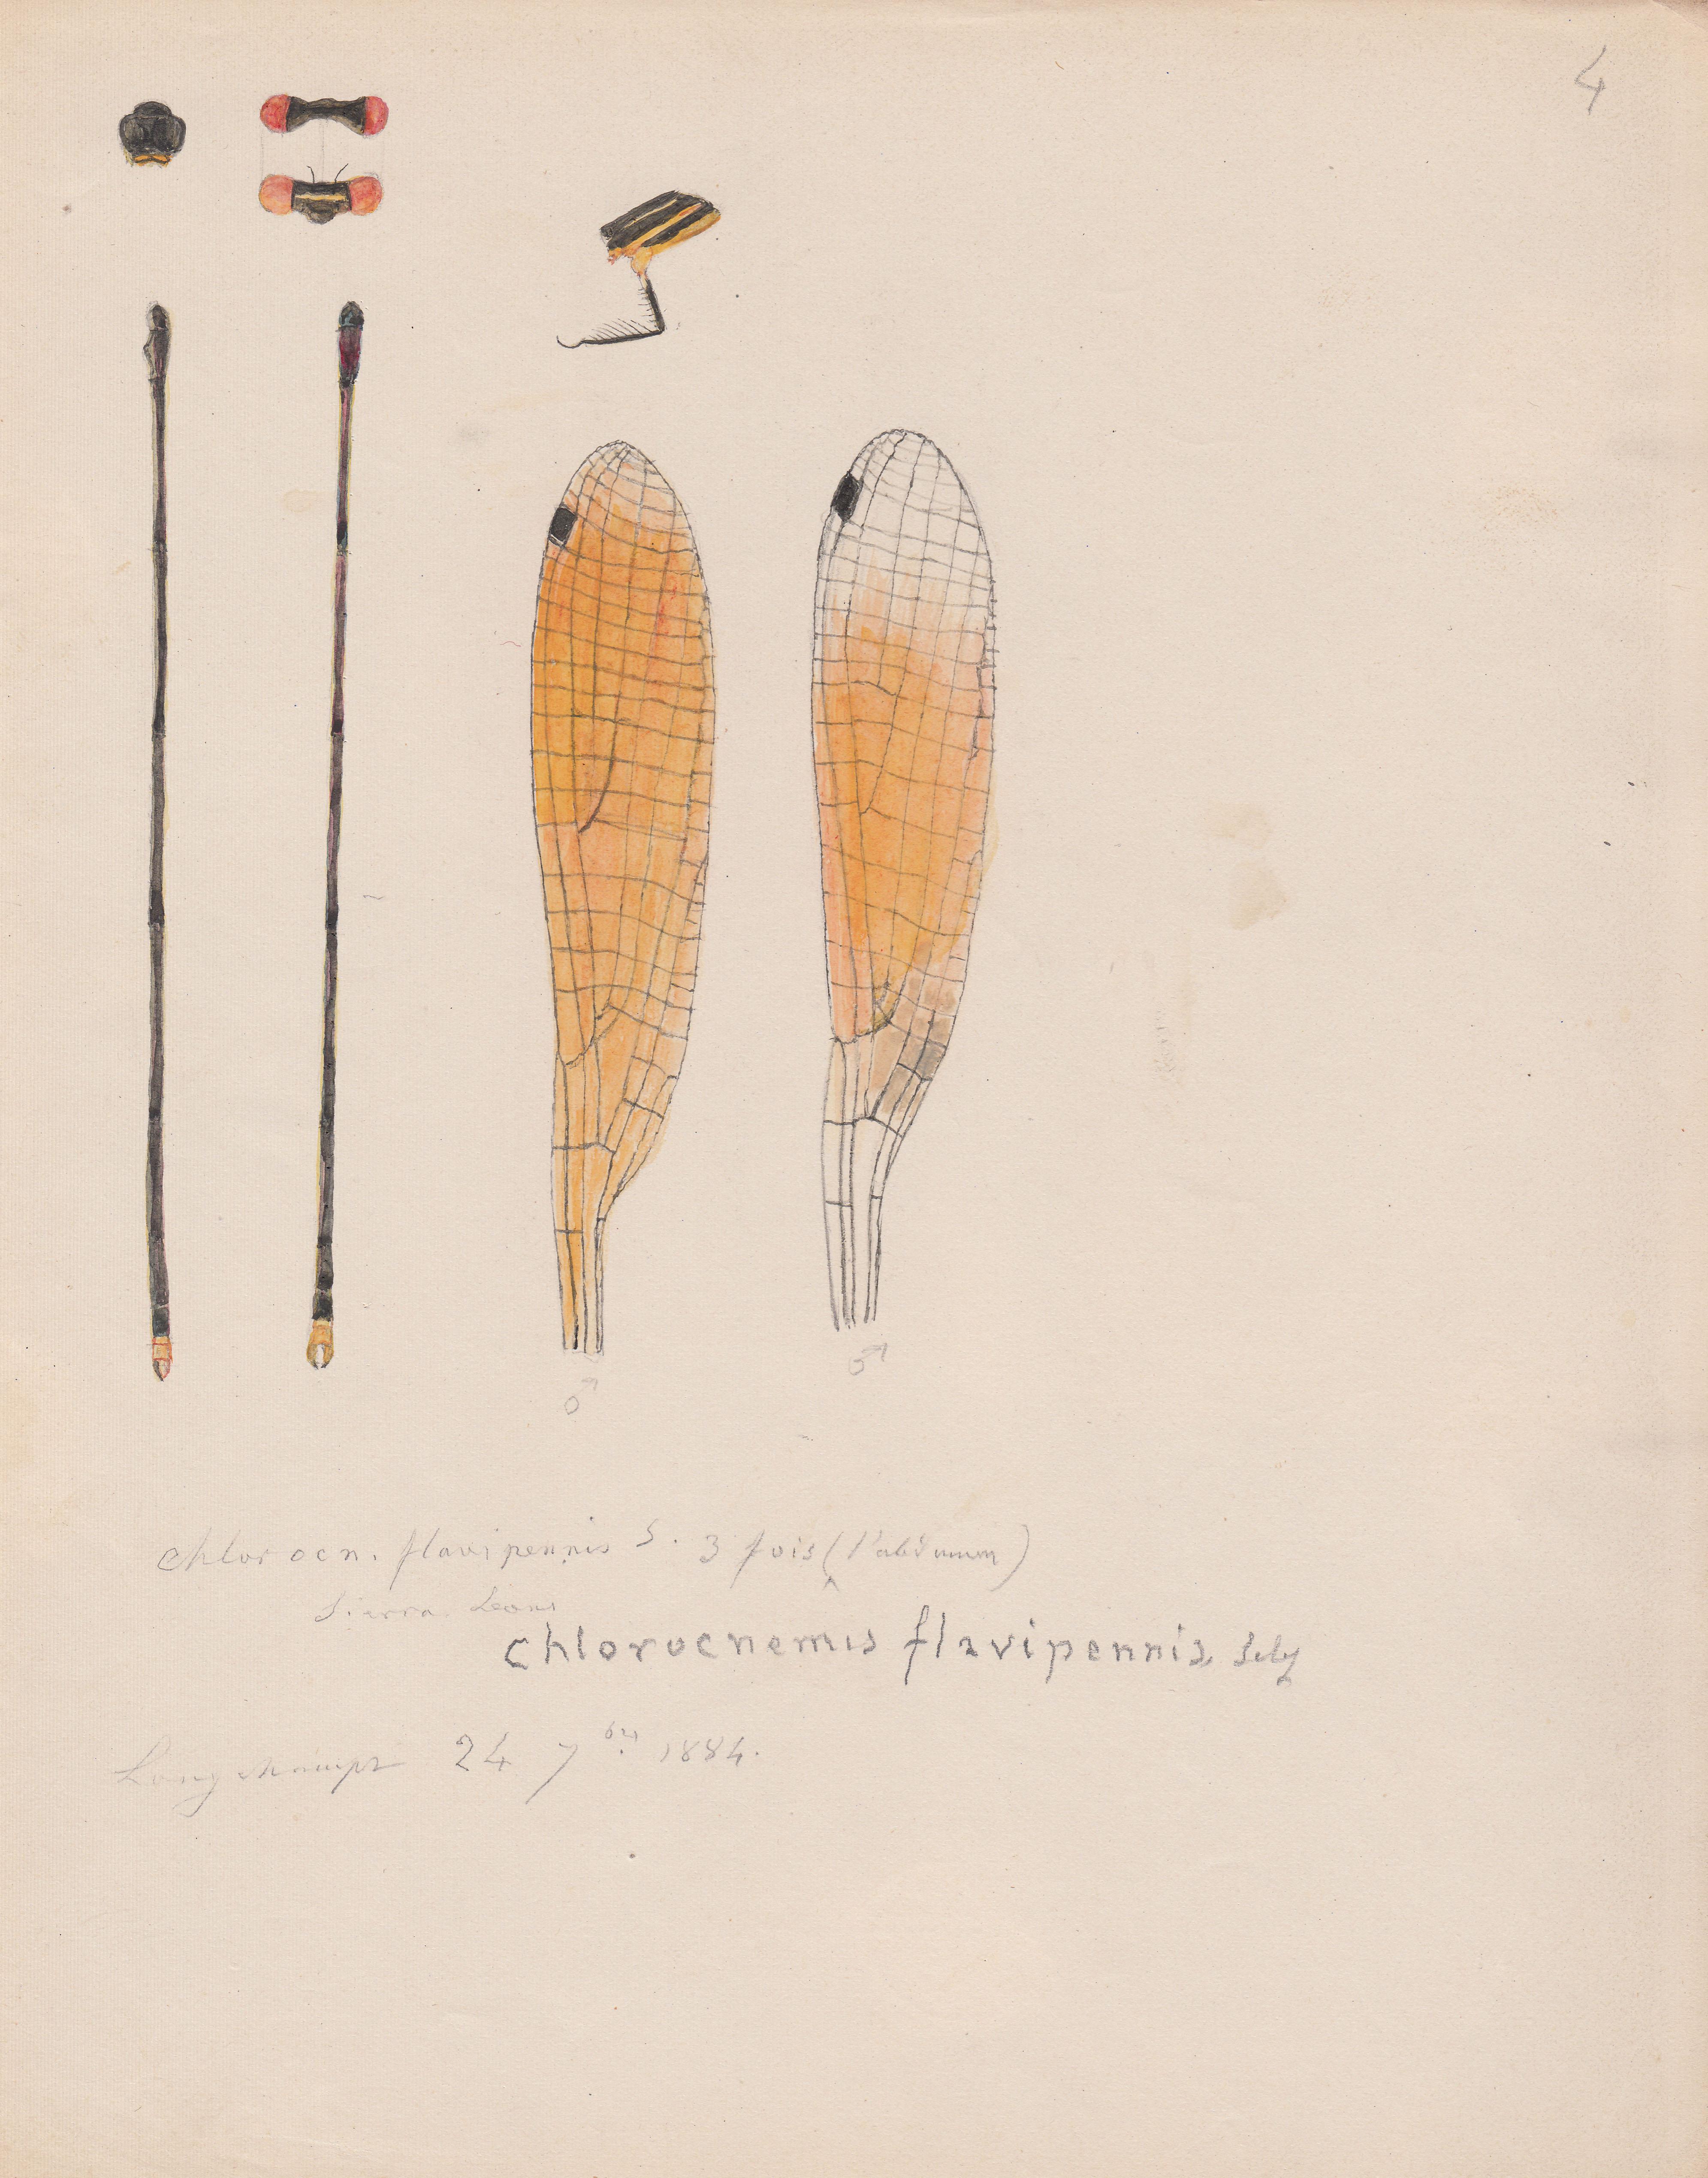 Chlorocnemis flavipennis.jpg